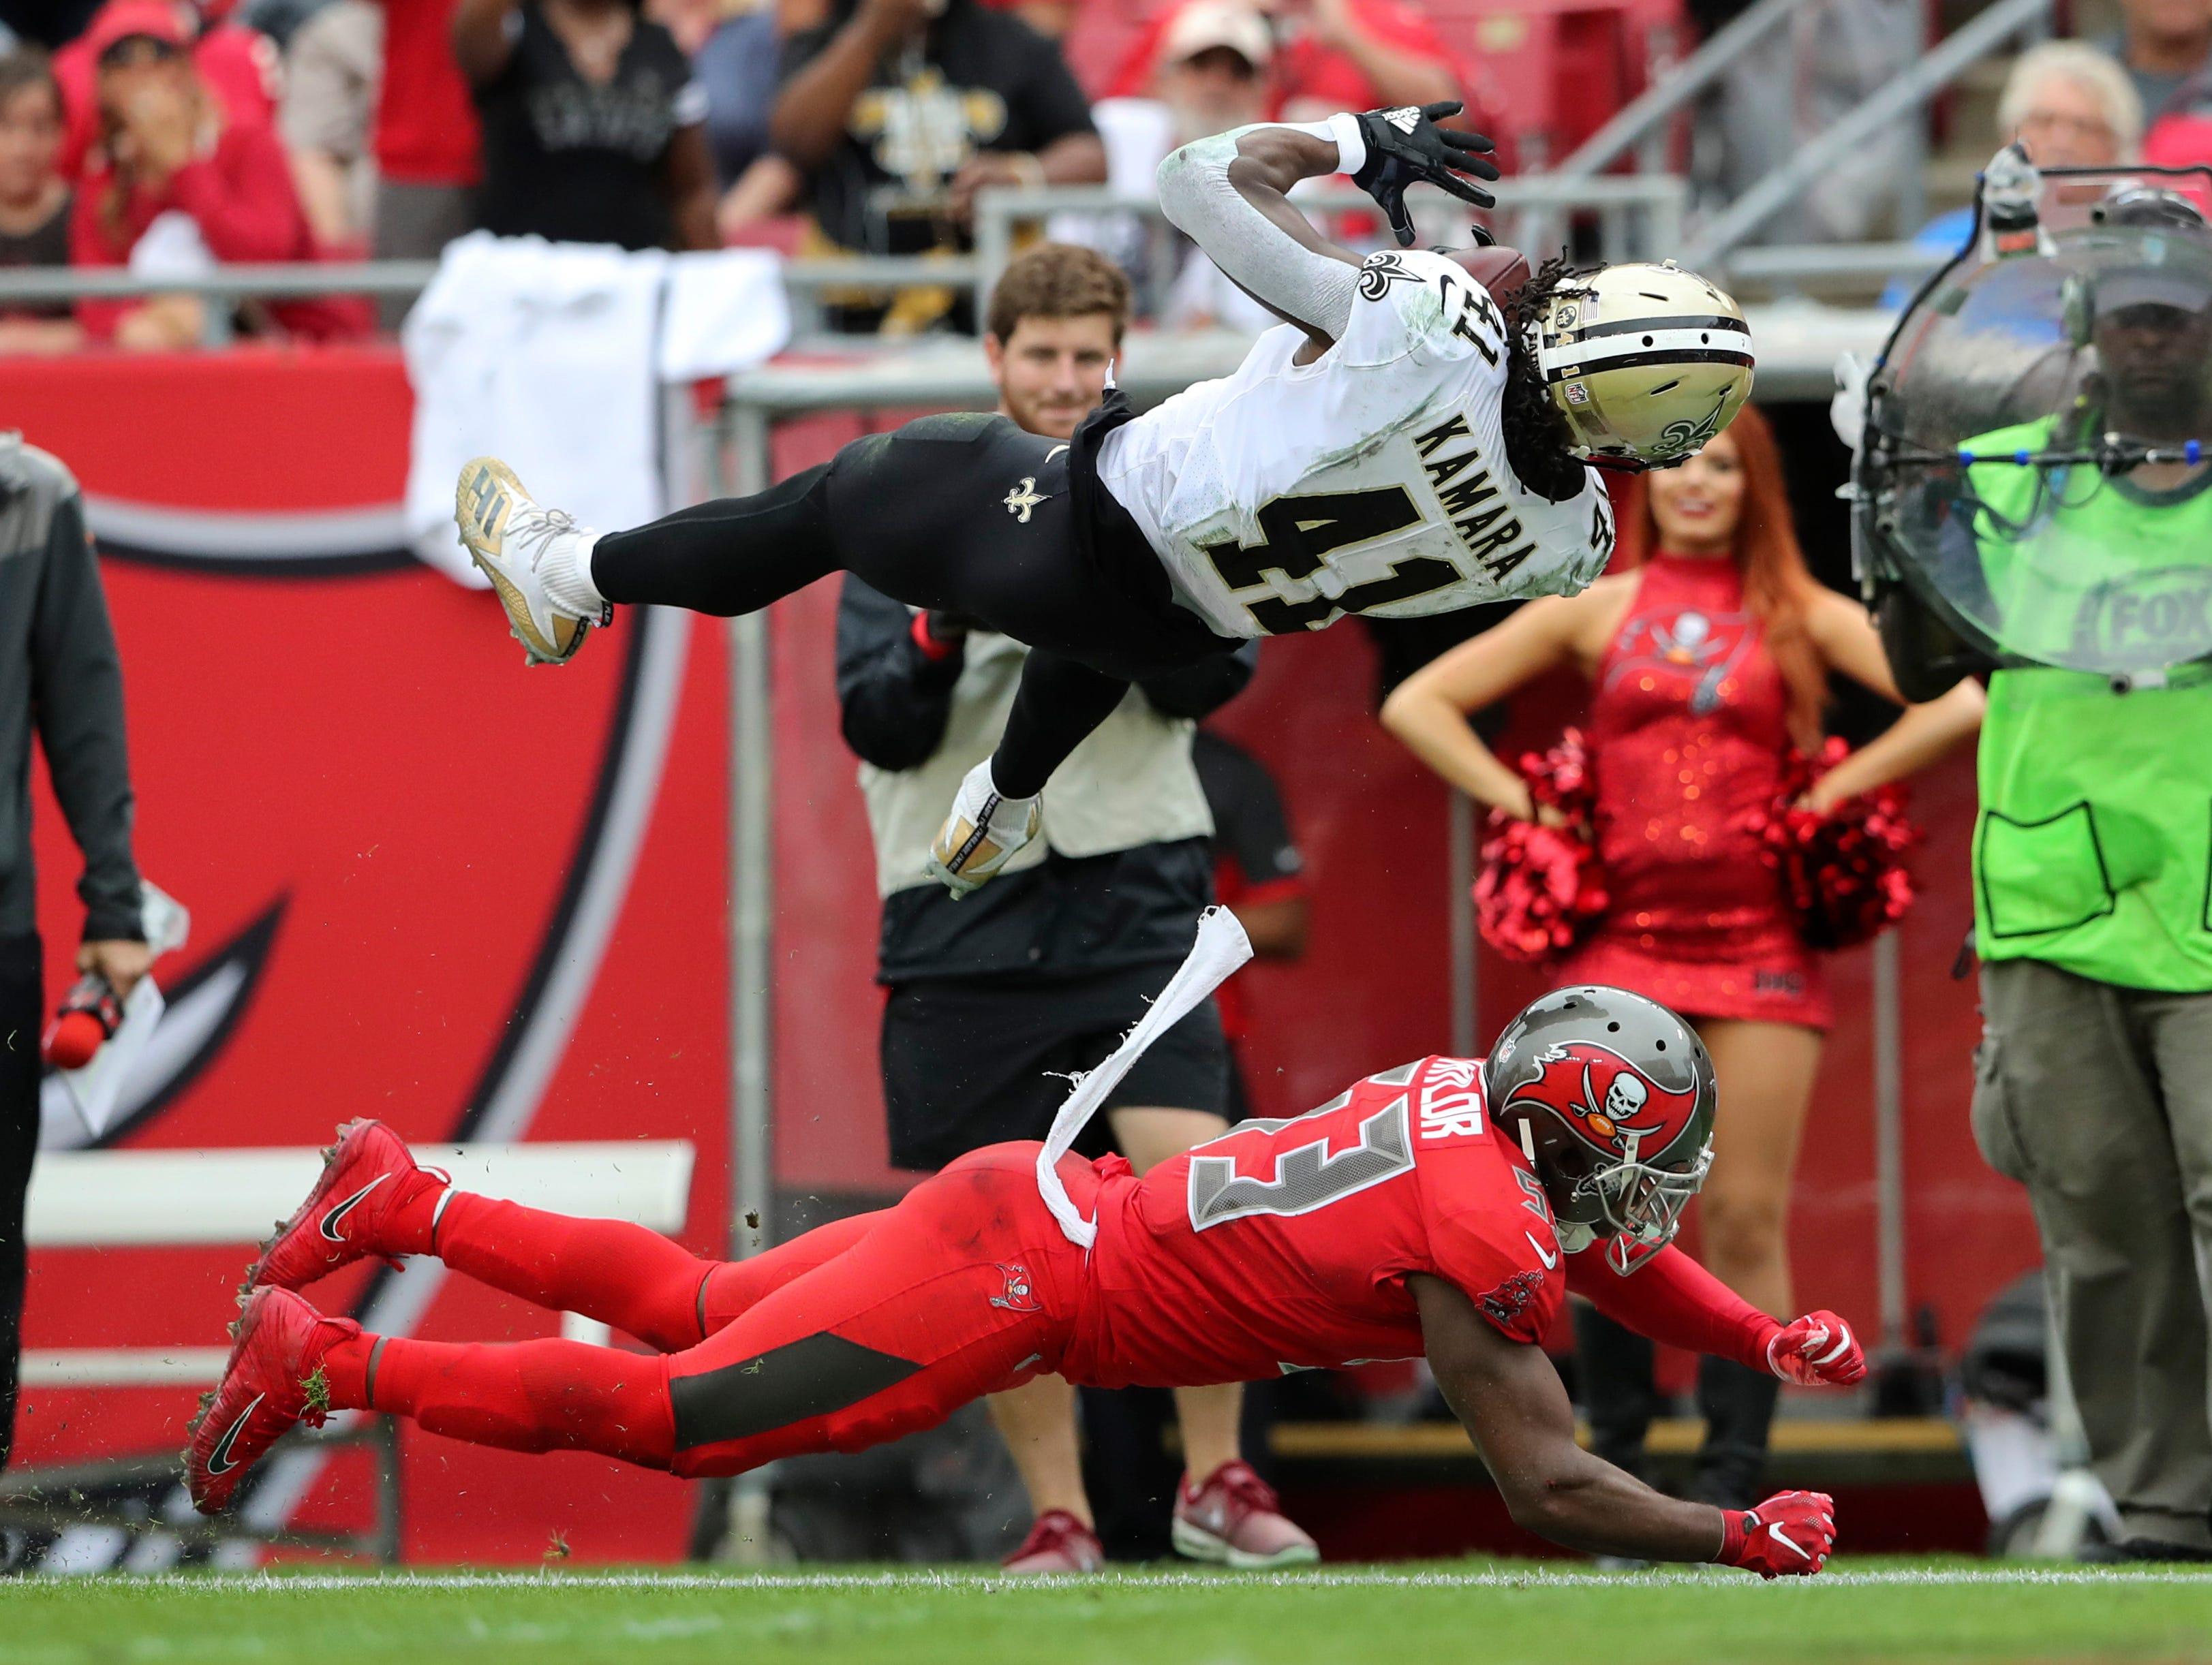 Saints running back Alvin Kamara leaps over Buccaneers outside linebacker Adarius Taylor during the second half.